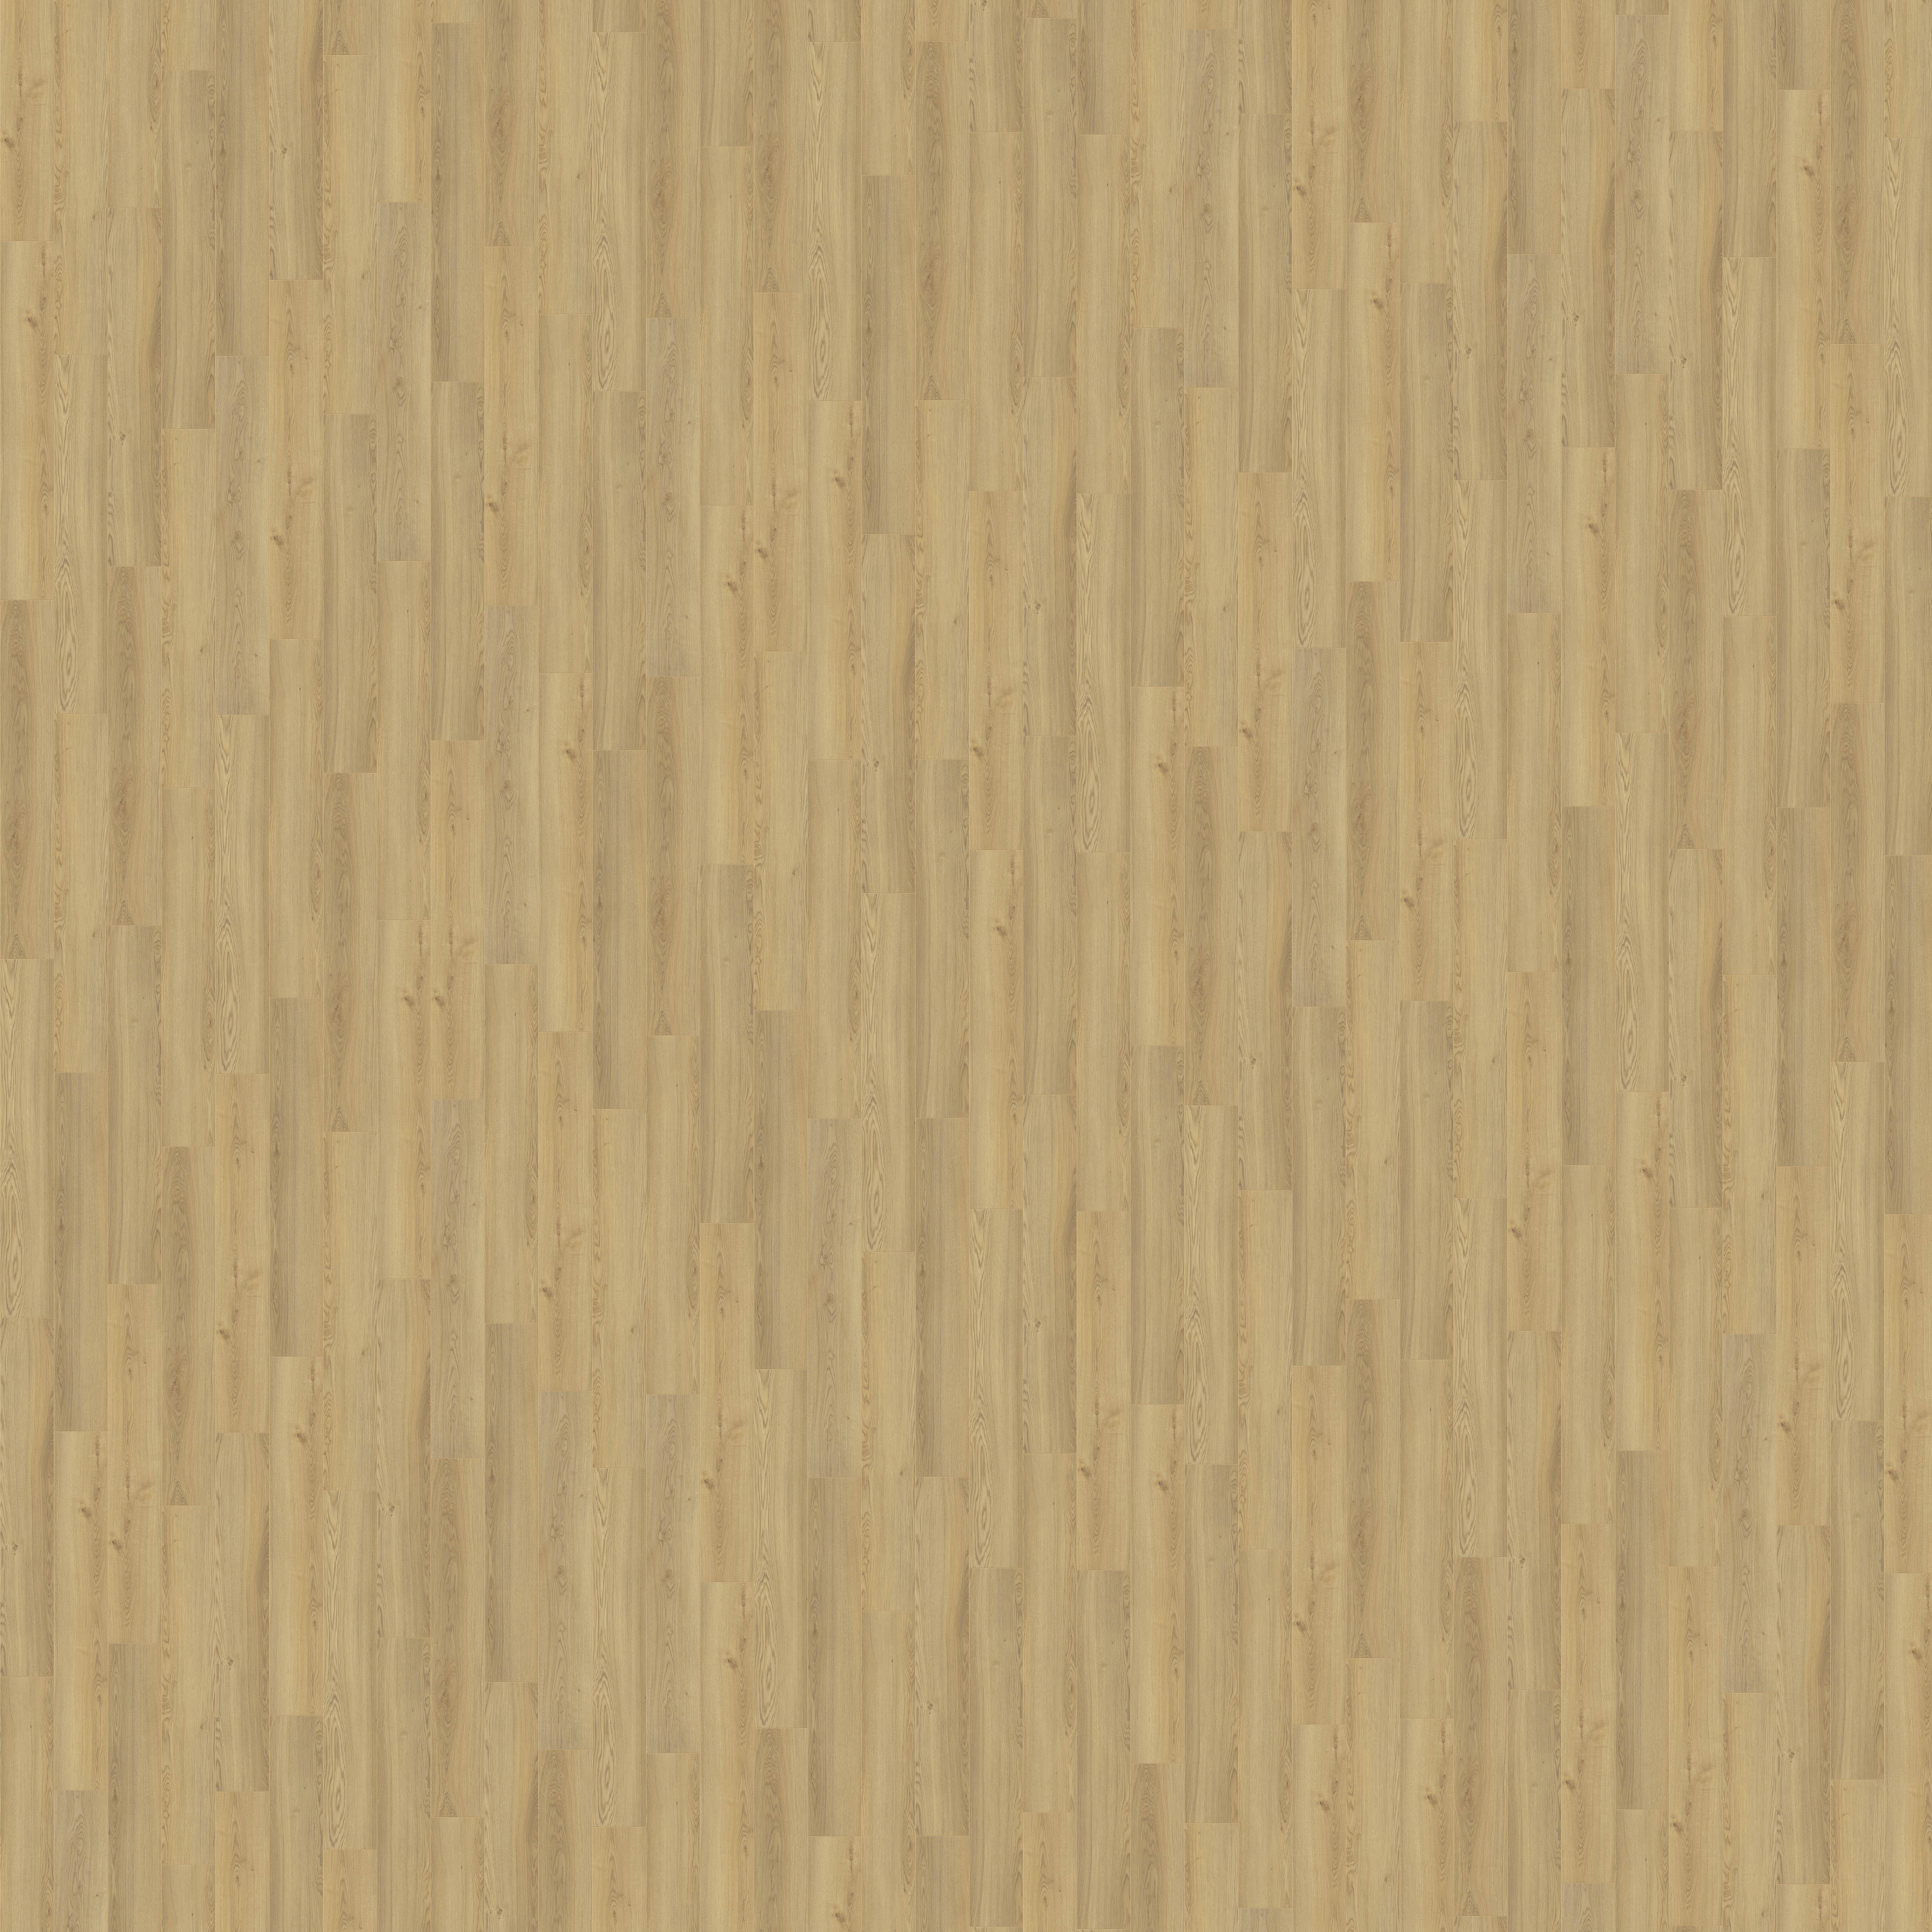 L0607 04394 Naturel Warme Eik Plank Pro Pergo Nl